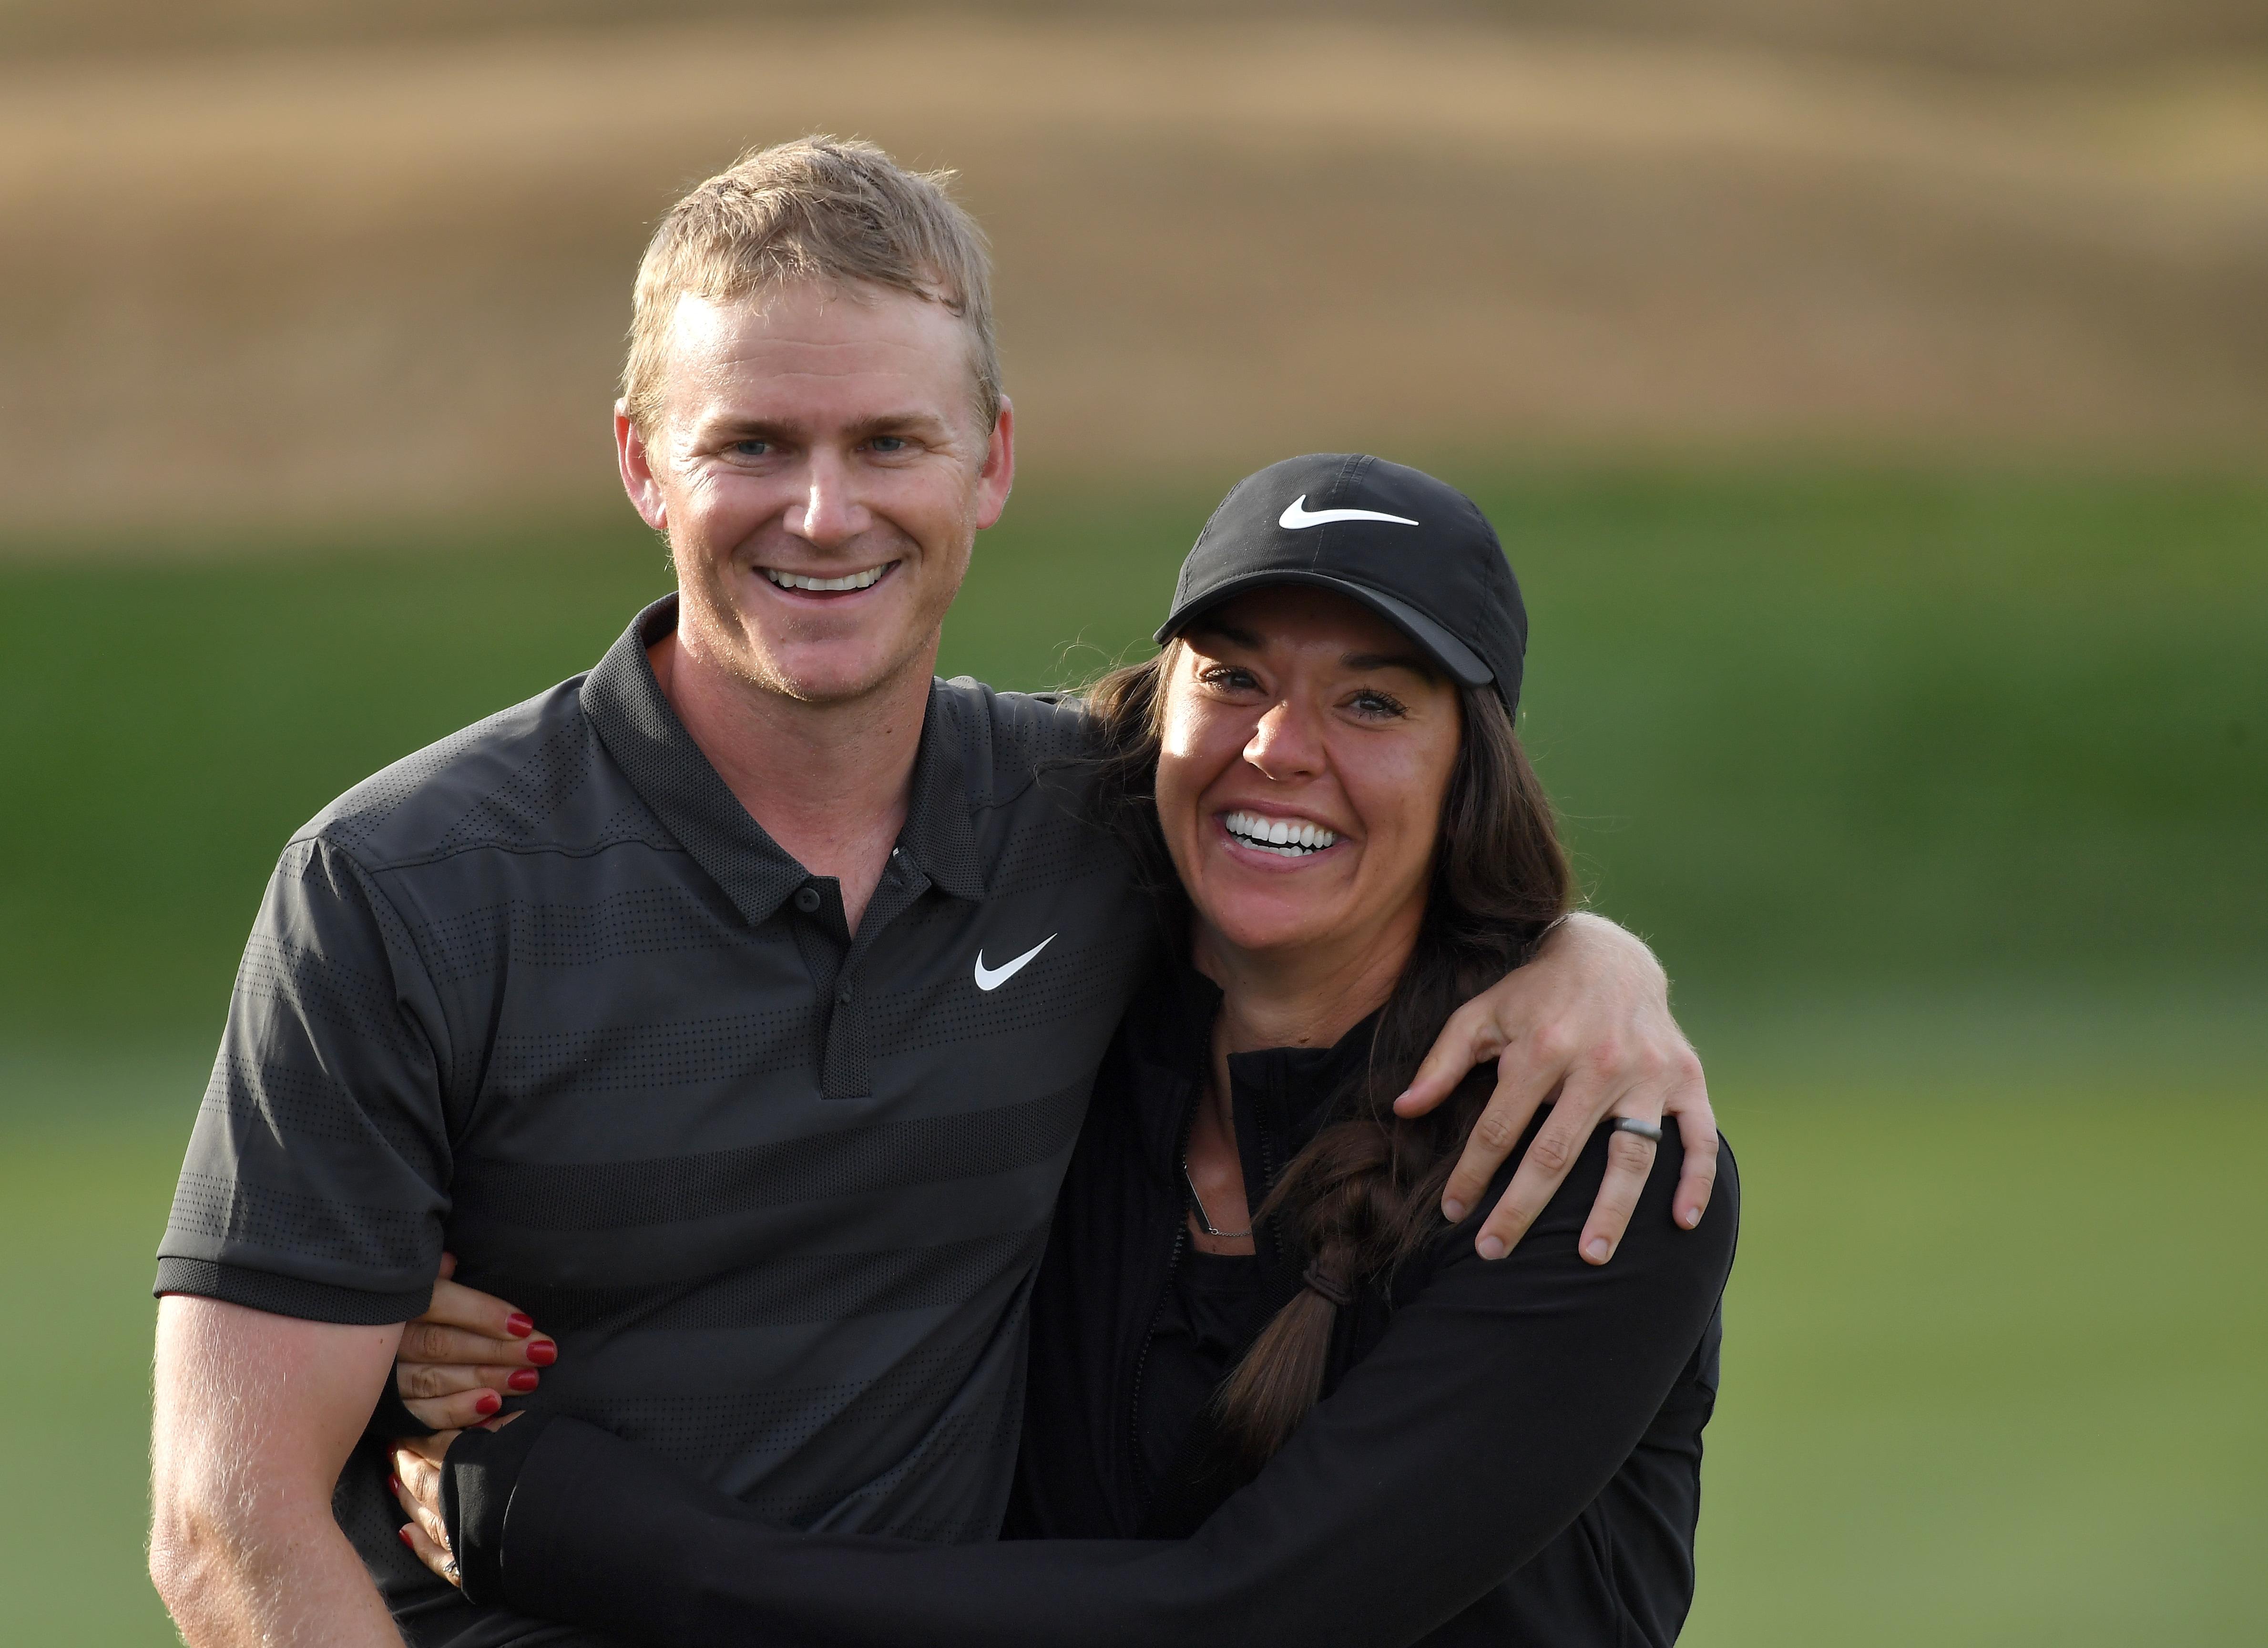 Adam Long and wife, Emily Long